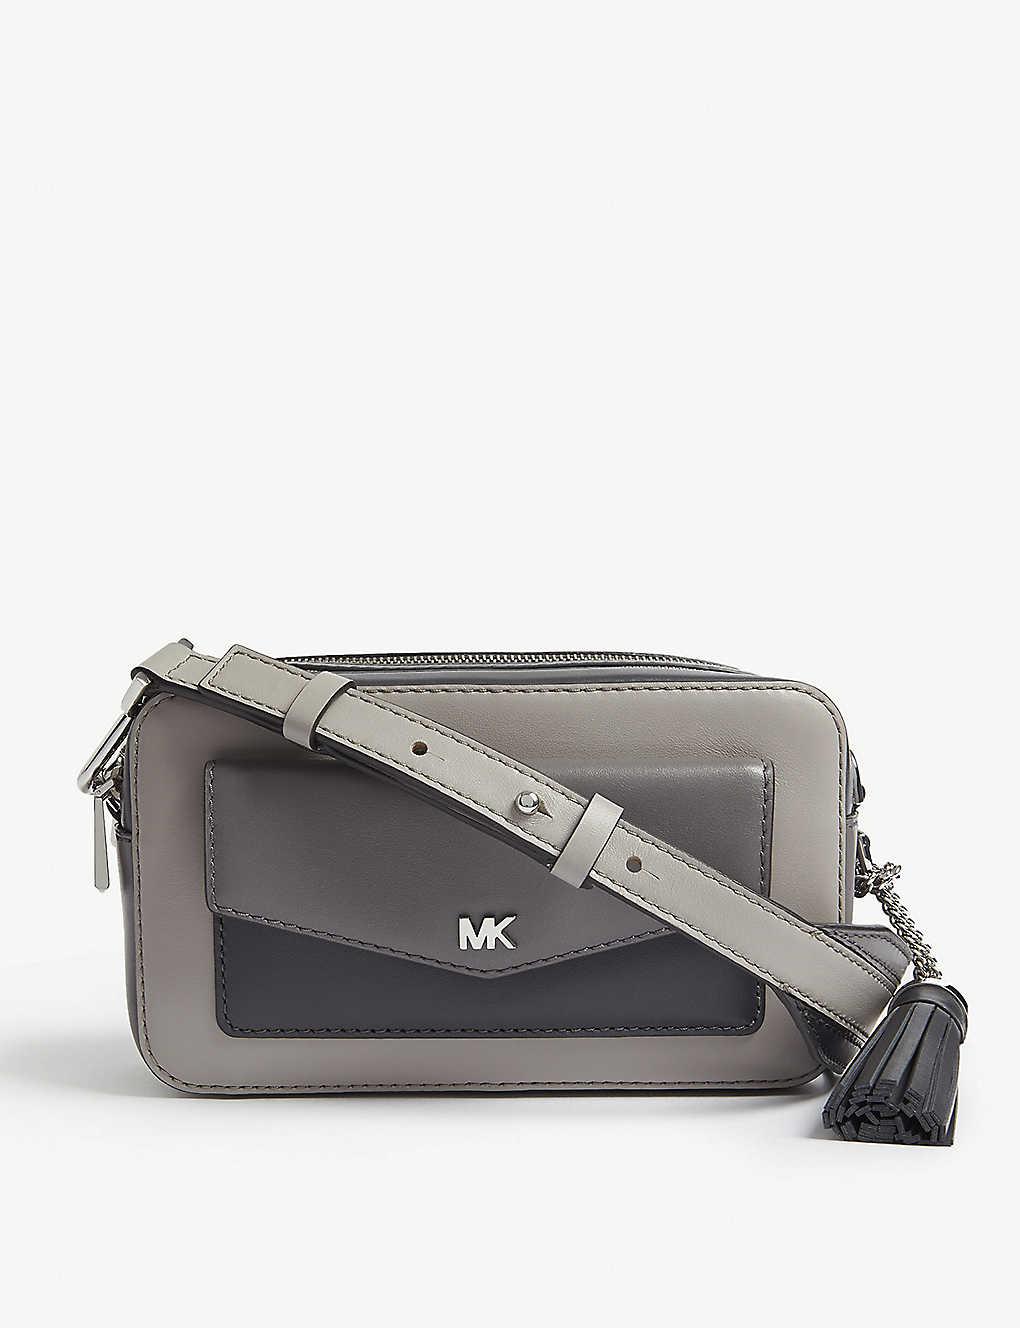 0ff730631e6f MICHAEL MICHAEL KORS - Leather small cross-body camera bag ...